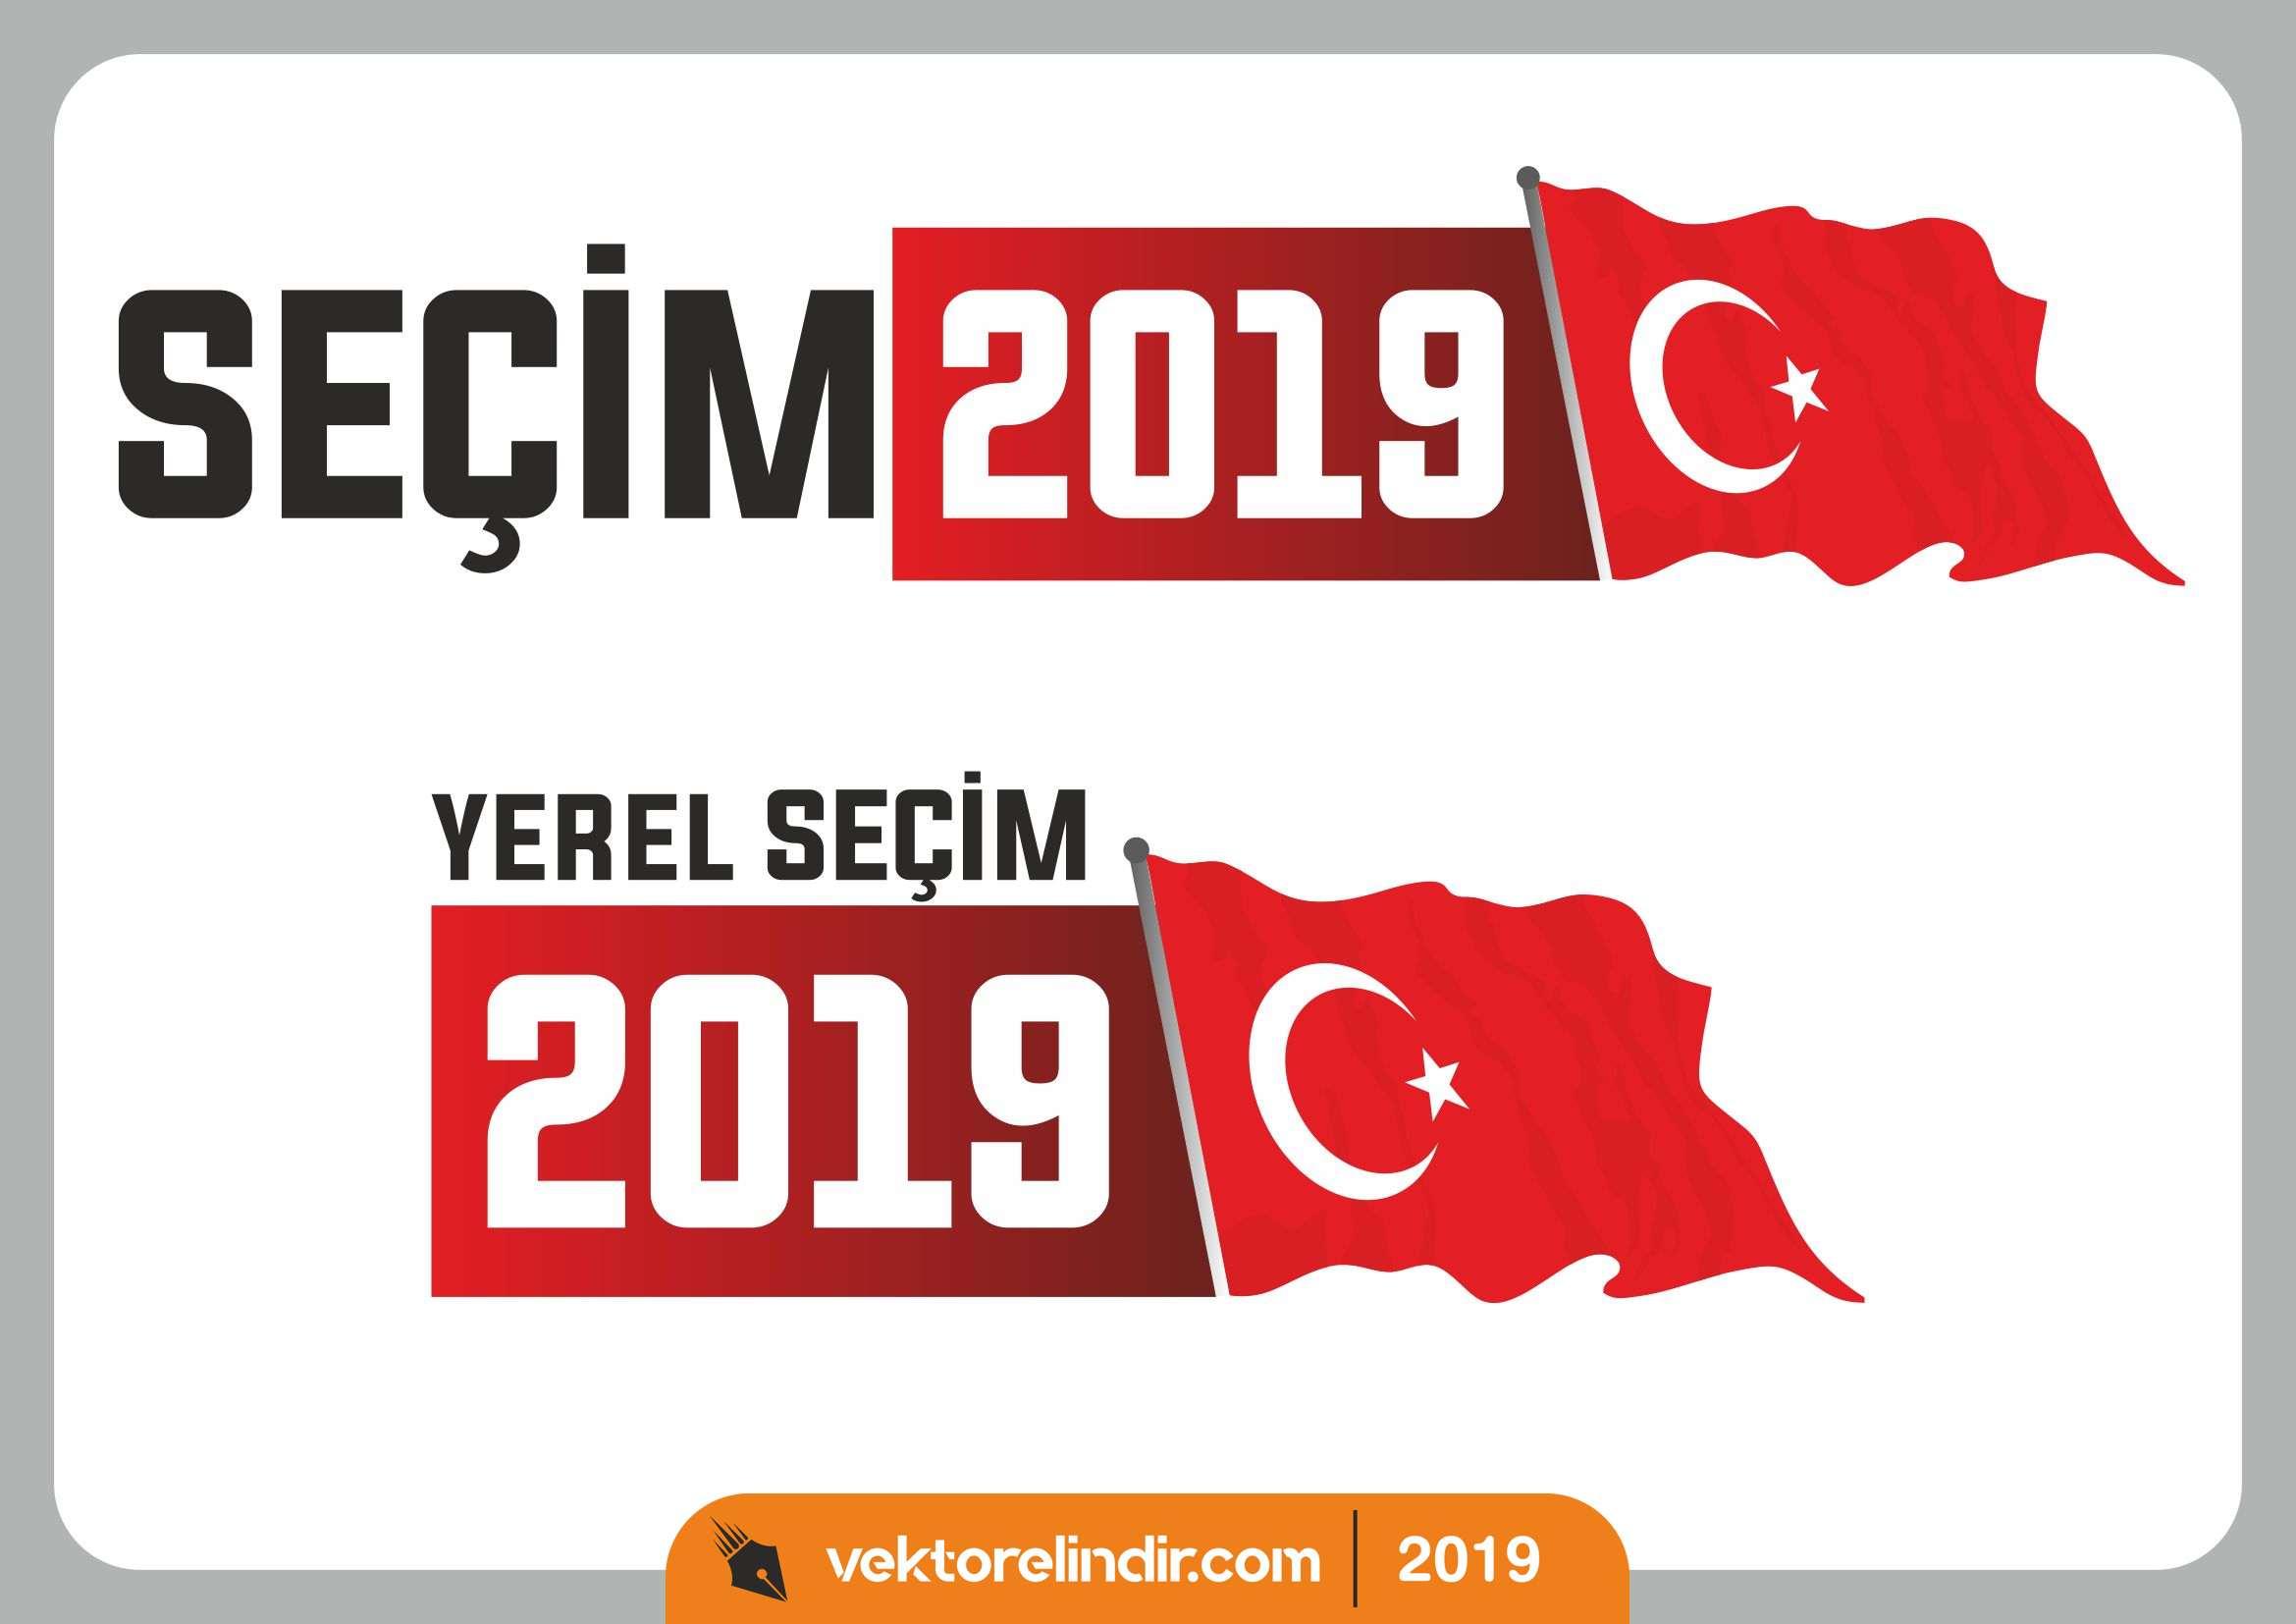 2019 Yerel Seçim, Seçim Logo, Vektörel